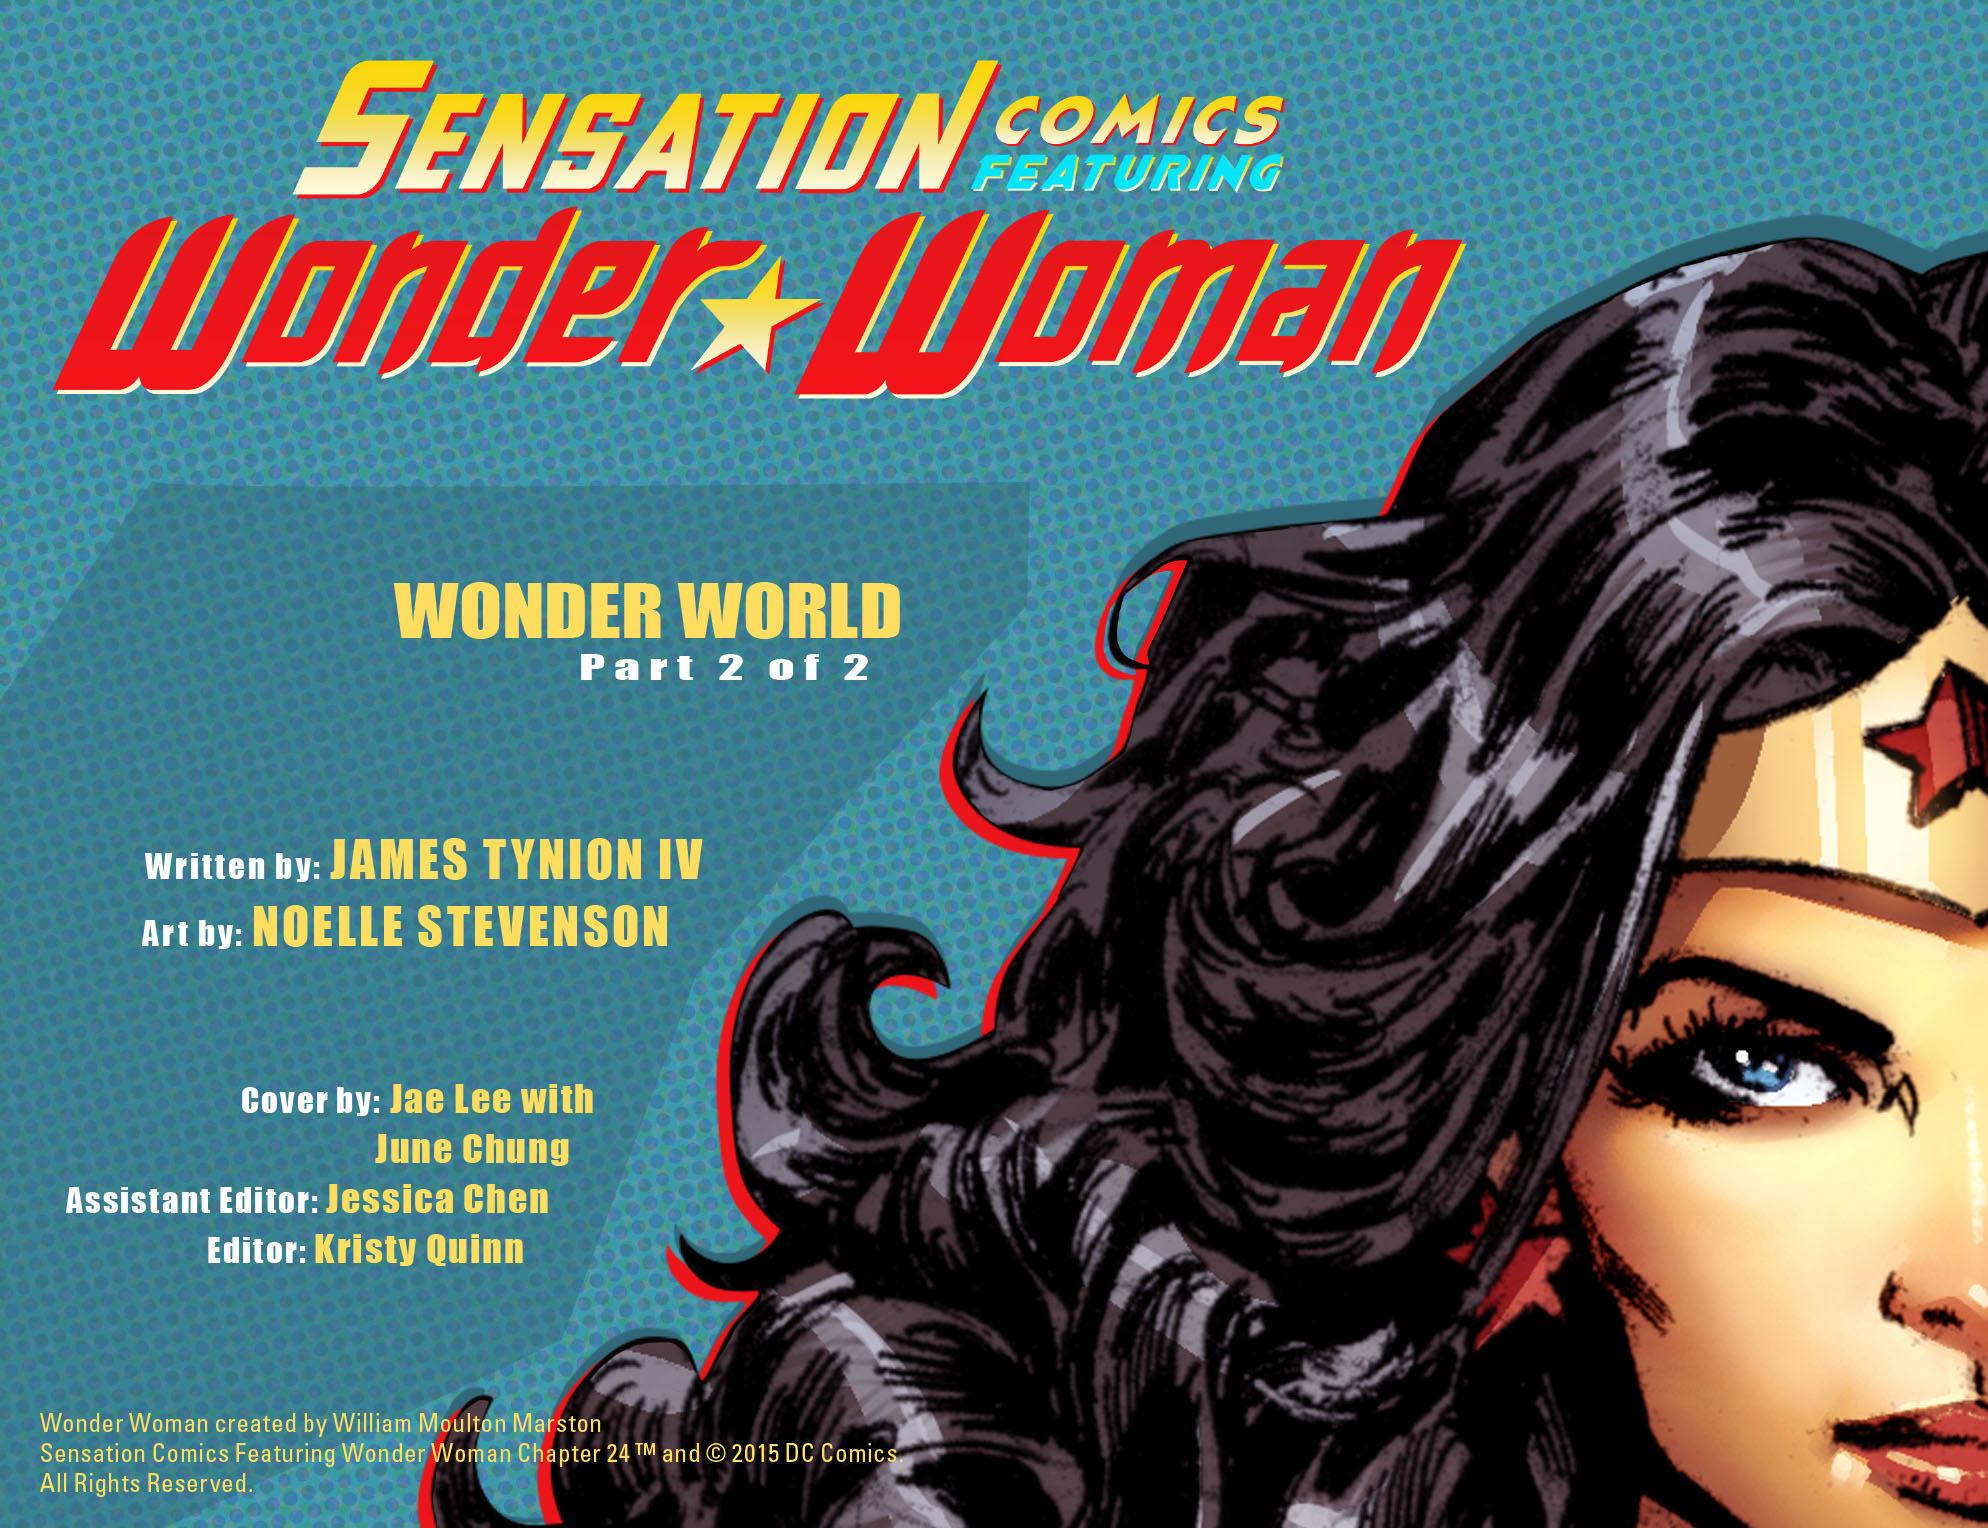 Read online Sensation Comics Featuring Wonder Woman comic -  Issue #24 - 2